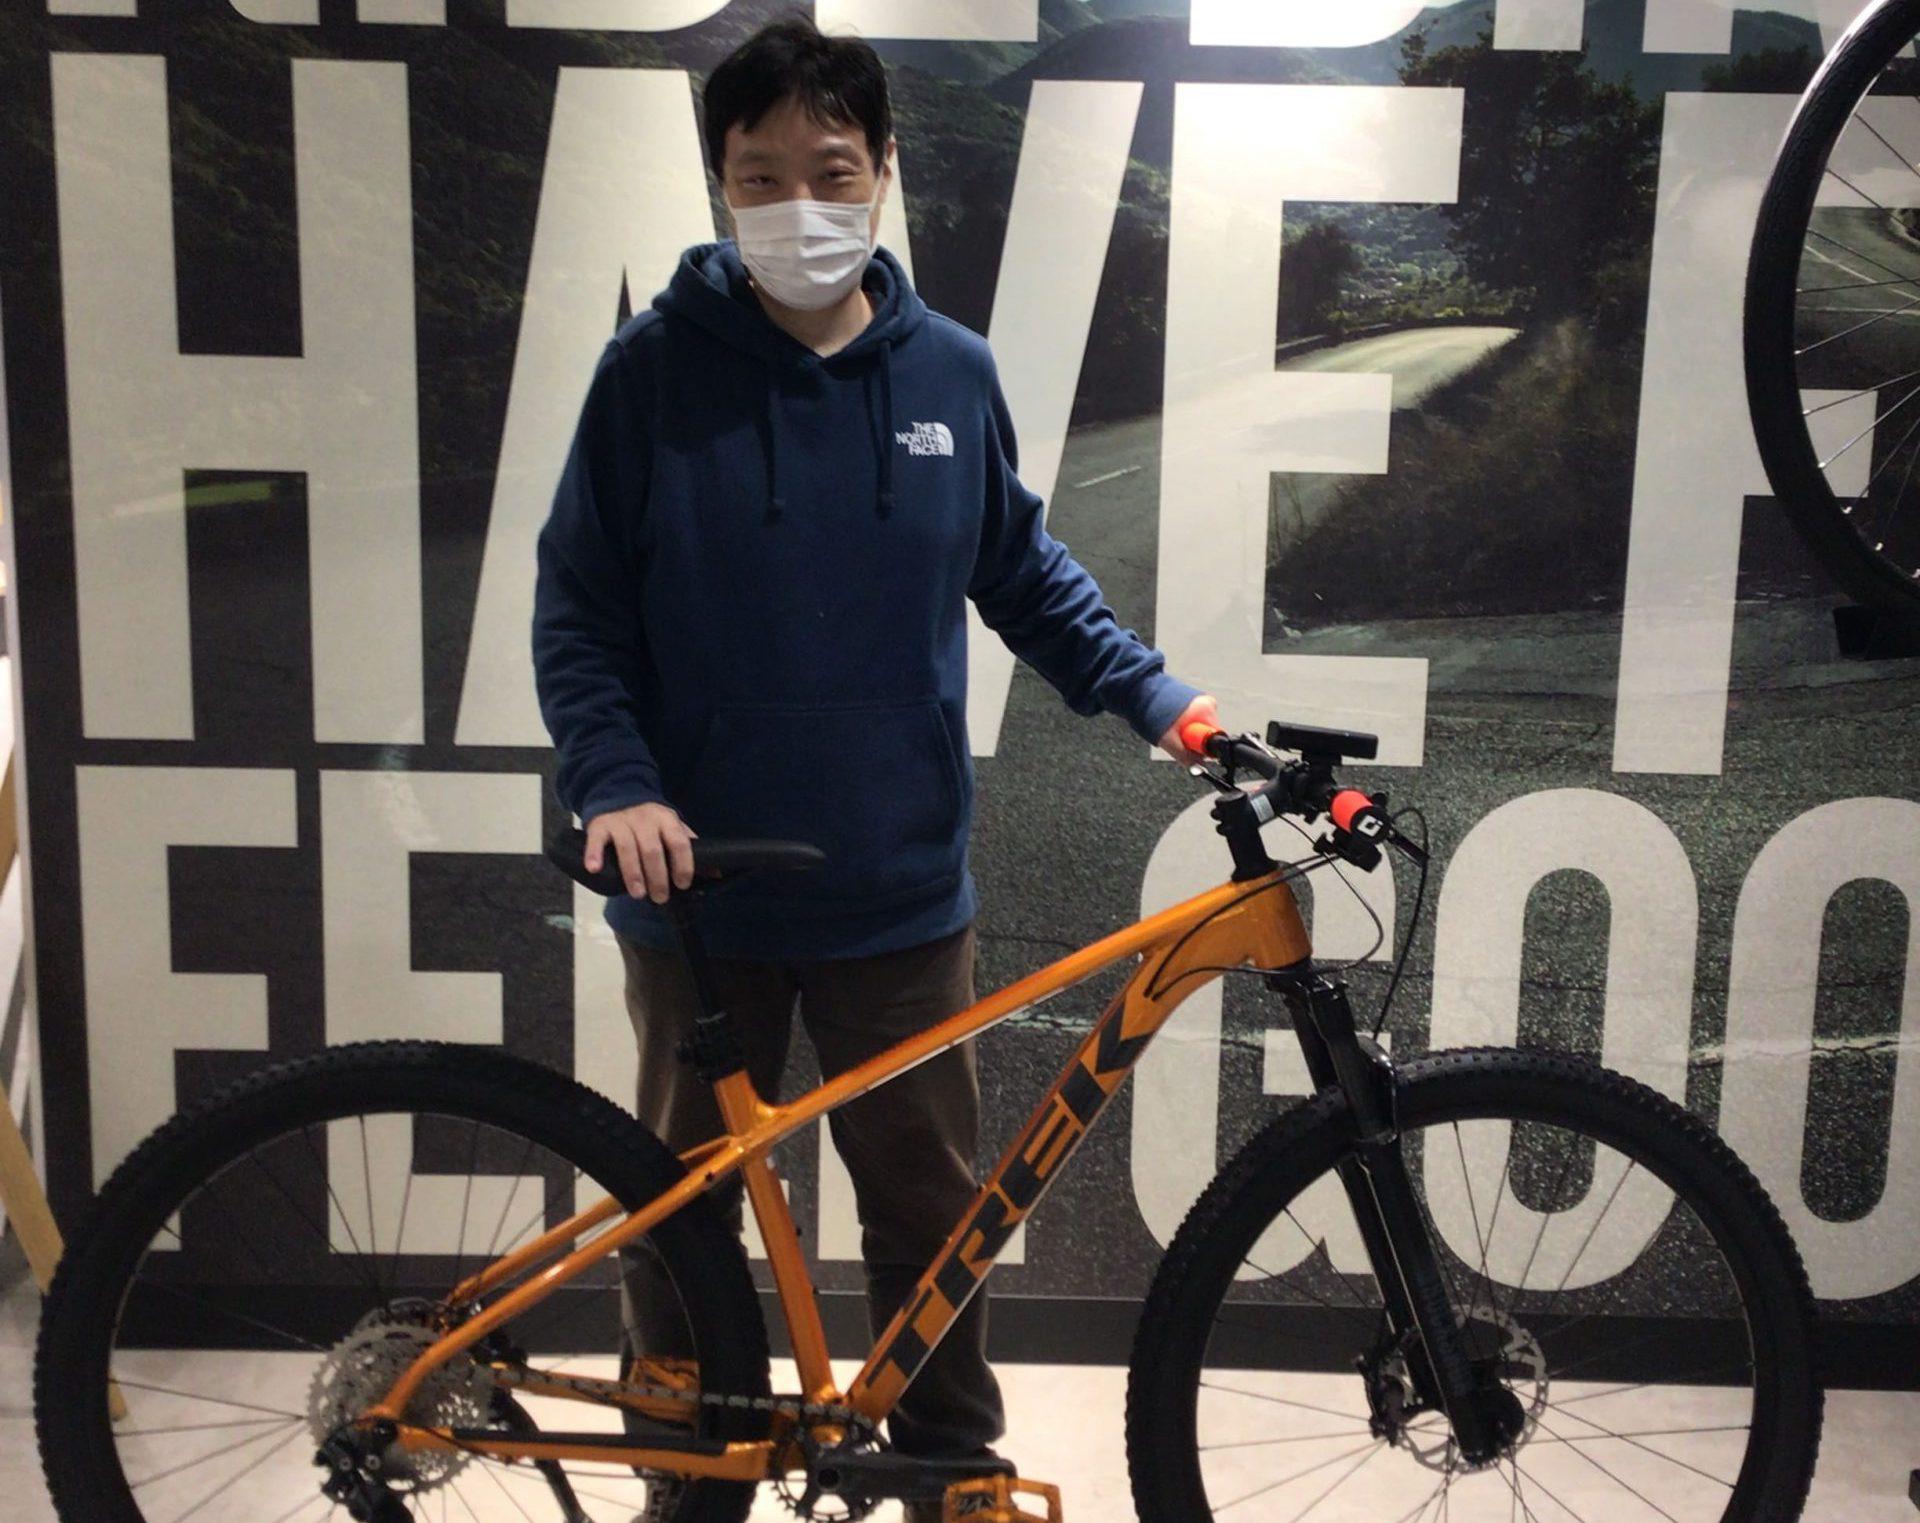 【Happy Bike New Day!】仙台泉中央店 X-Caliber 7 ご納車シーン